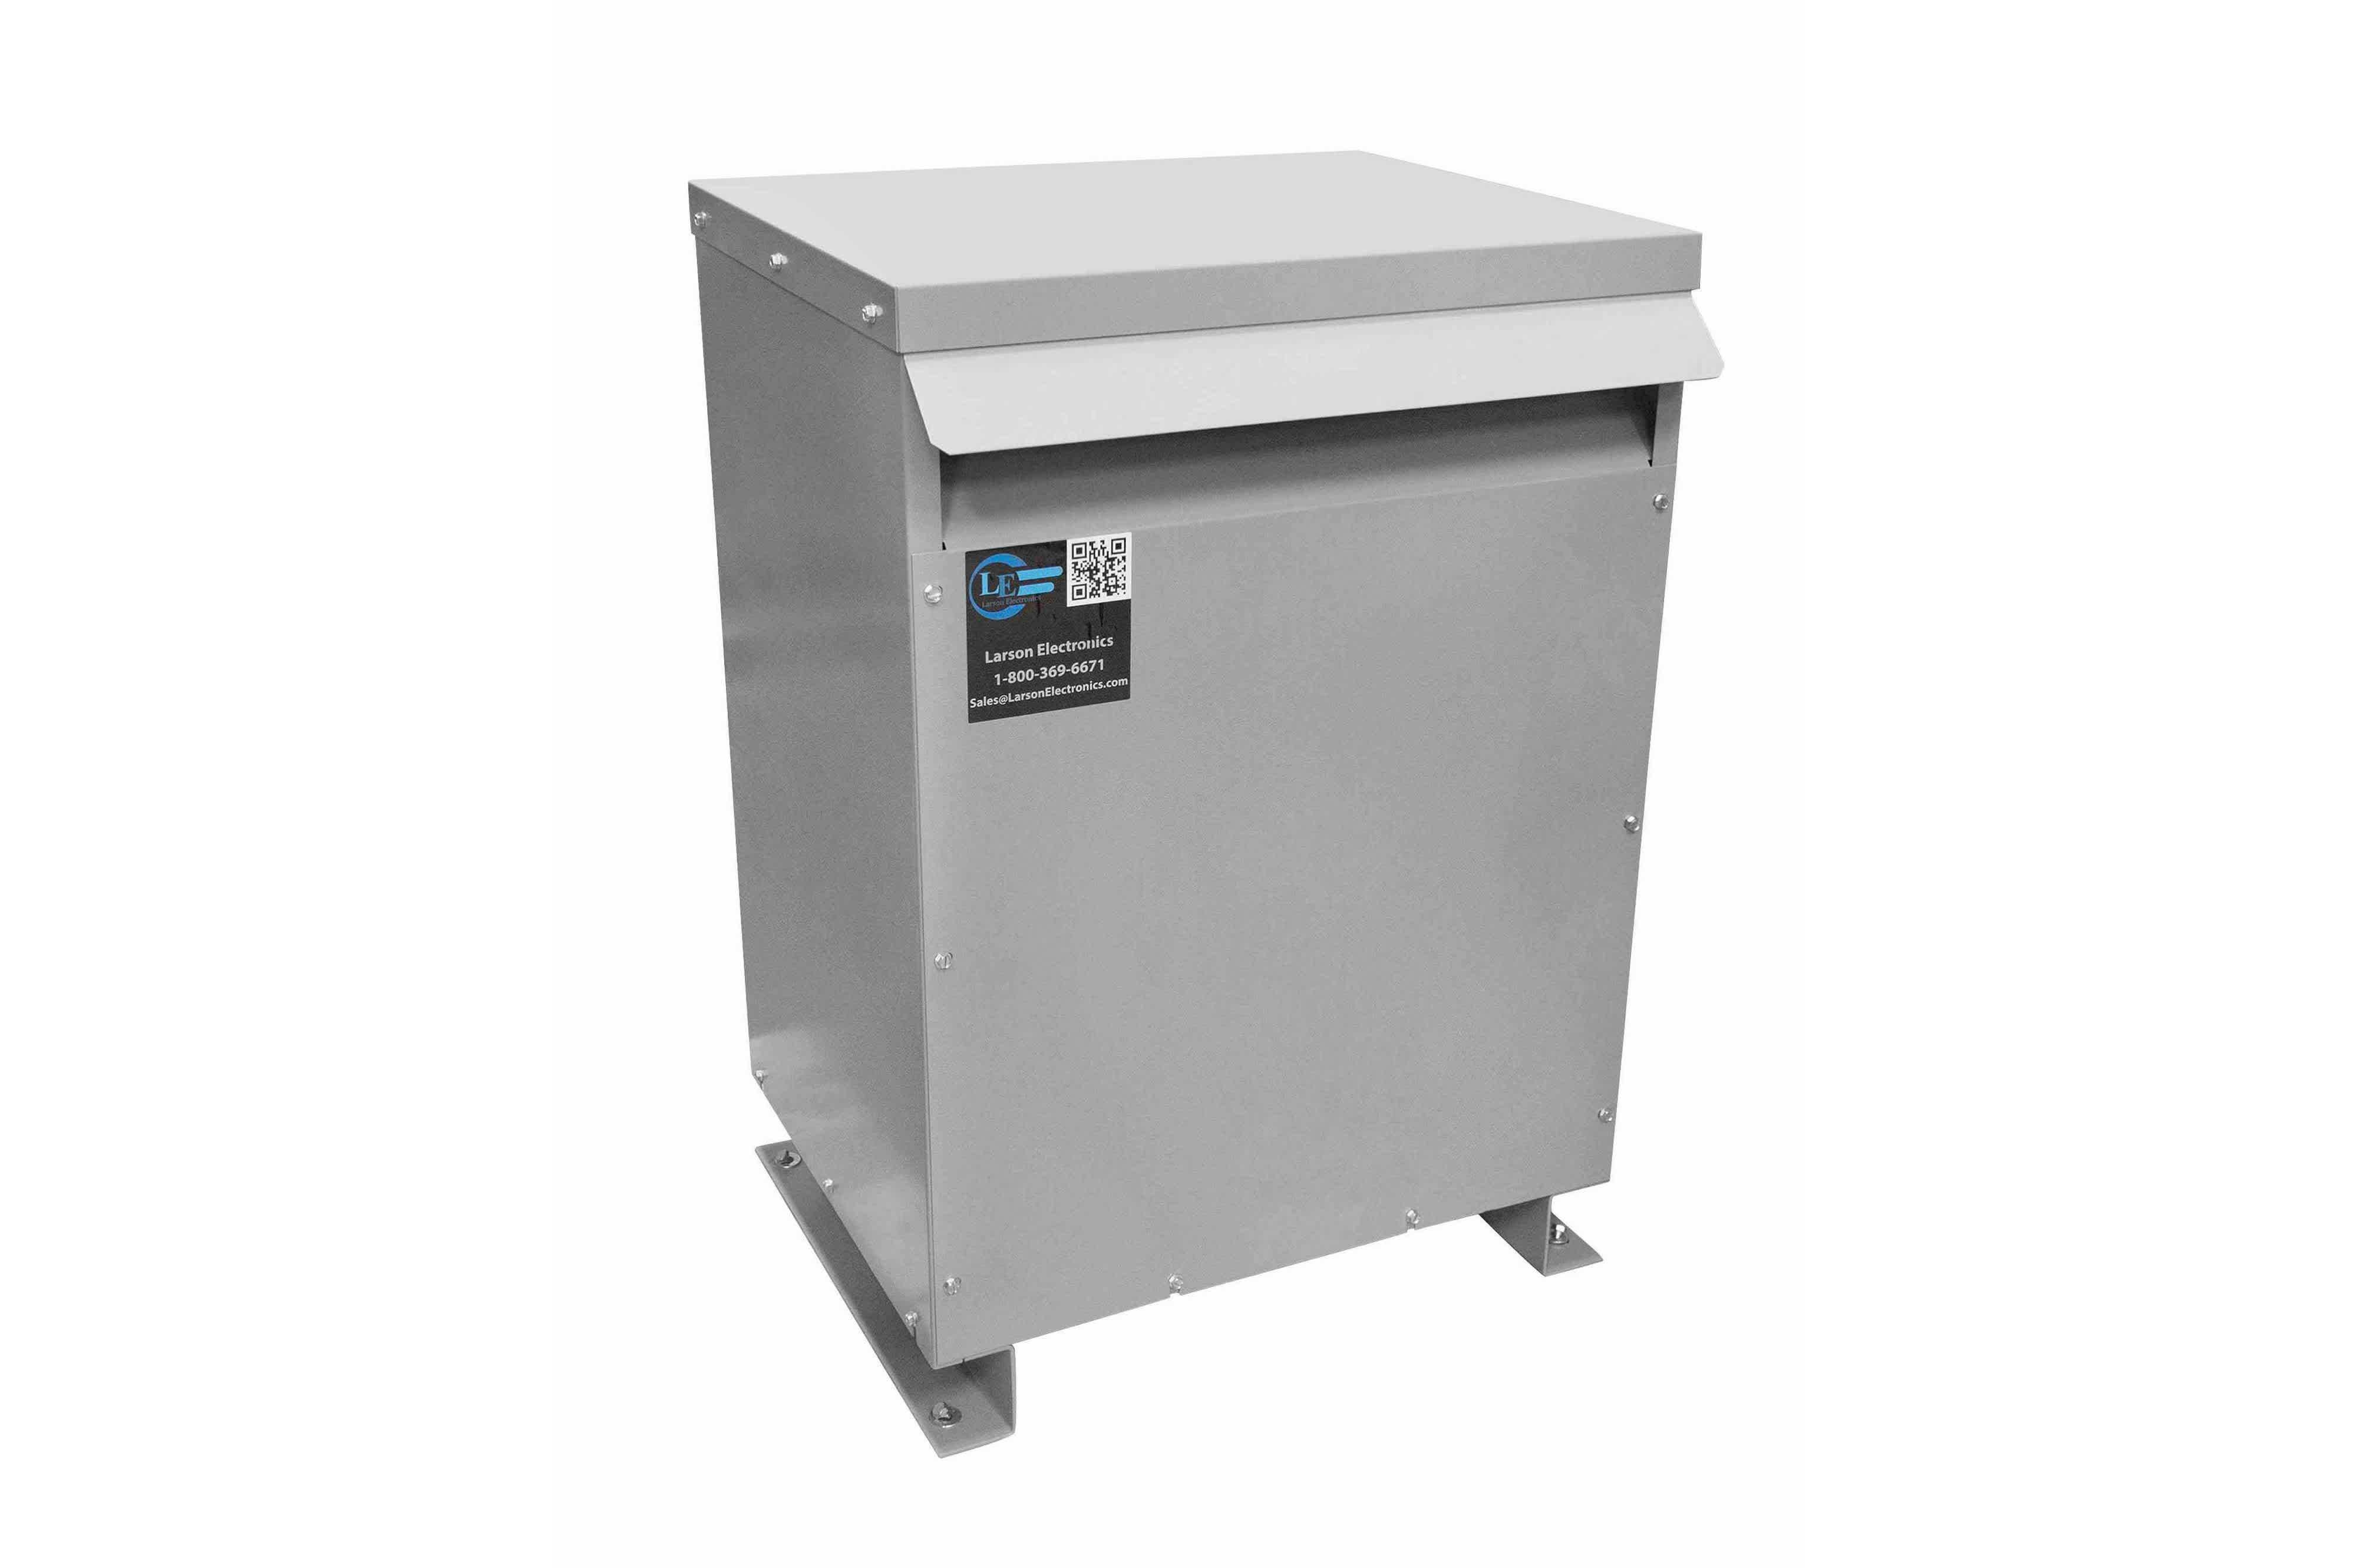 110 kVA 3PH Isolation Transformer, 480V Wye Primary, 380Y/220 Wye-N Secondary, N3R, Ventilated, 60 Hz